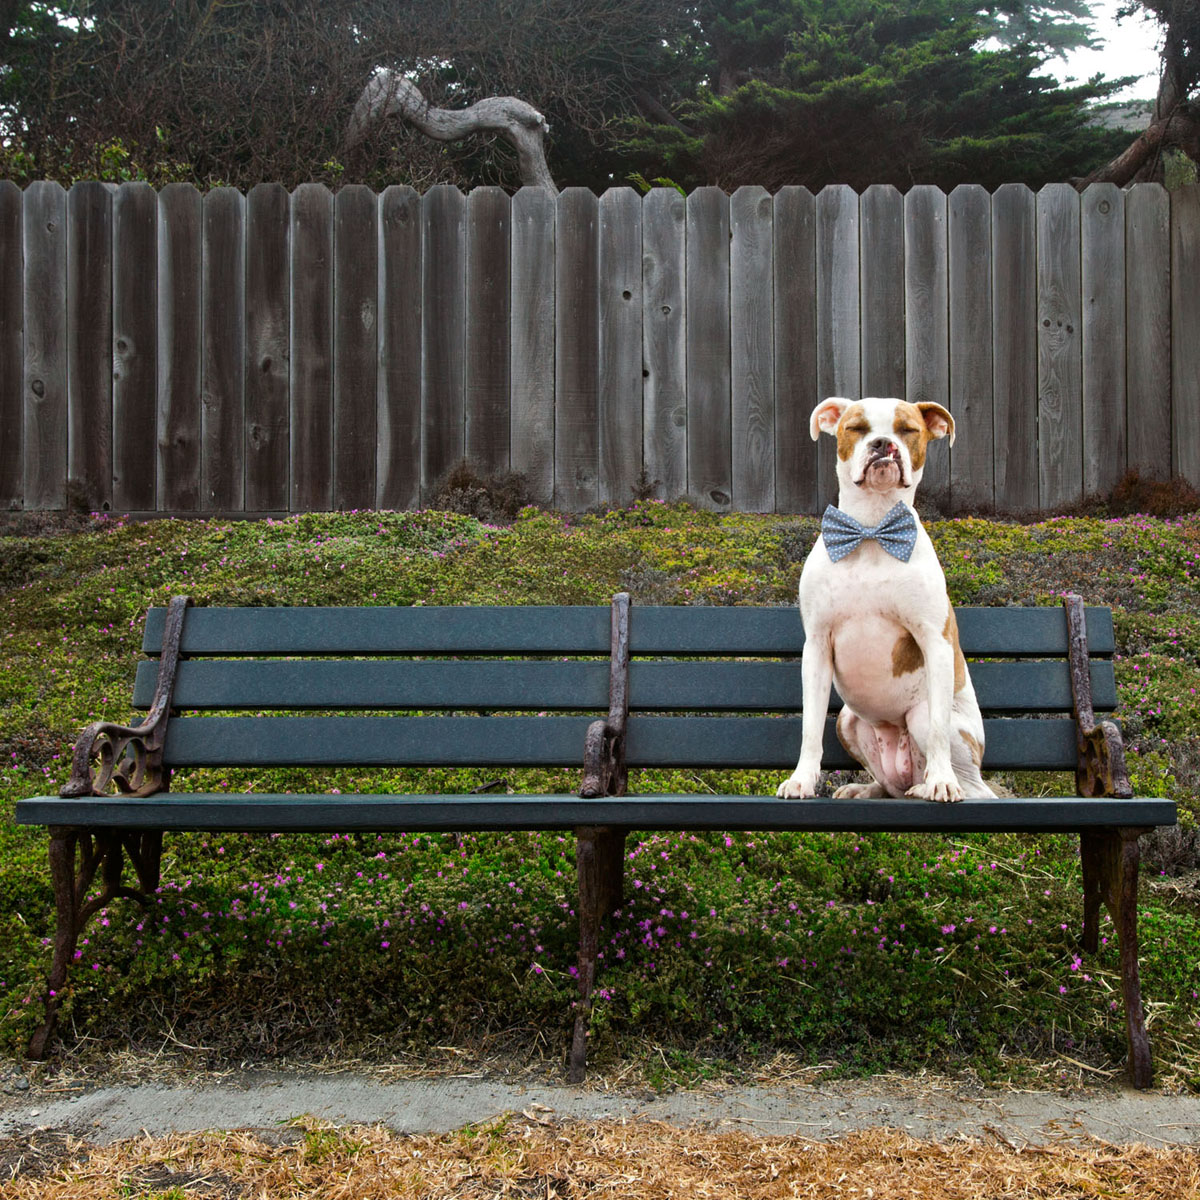 Puka on a bench